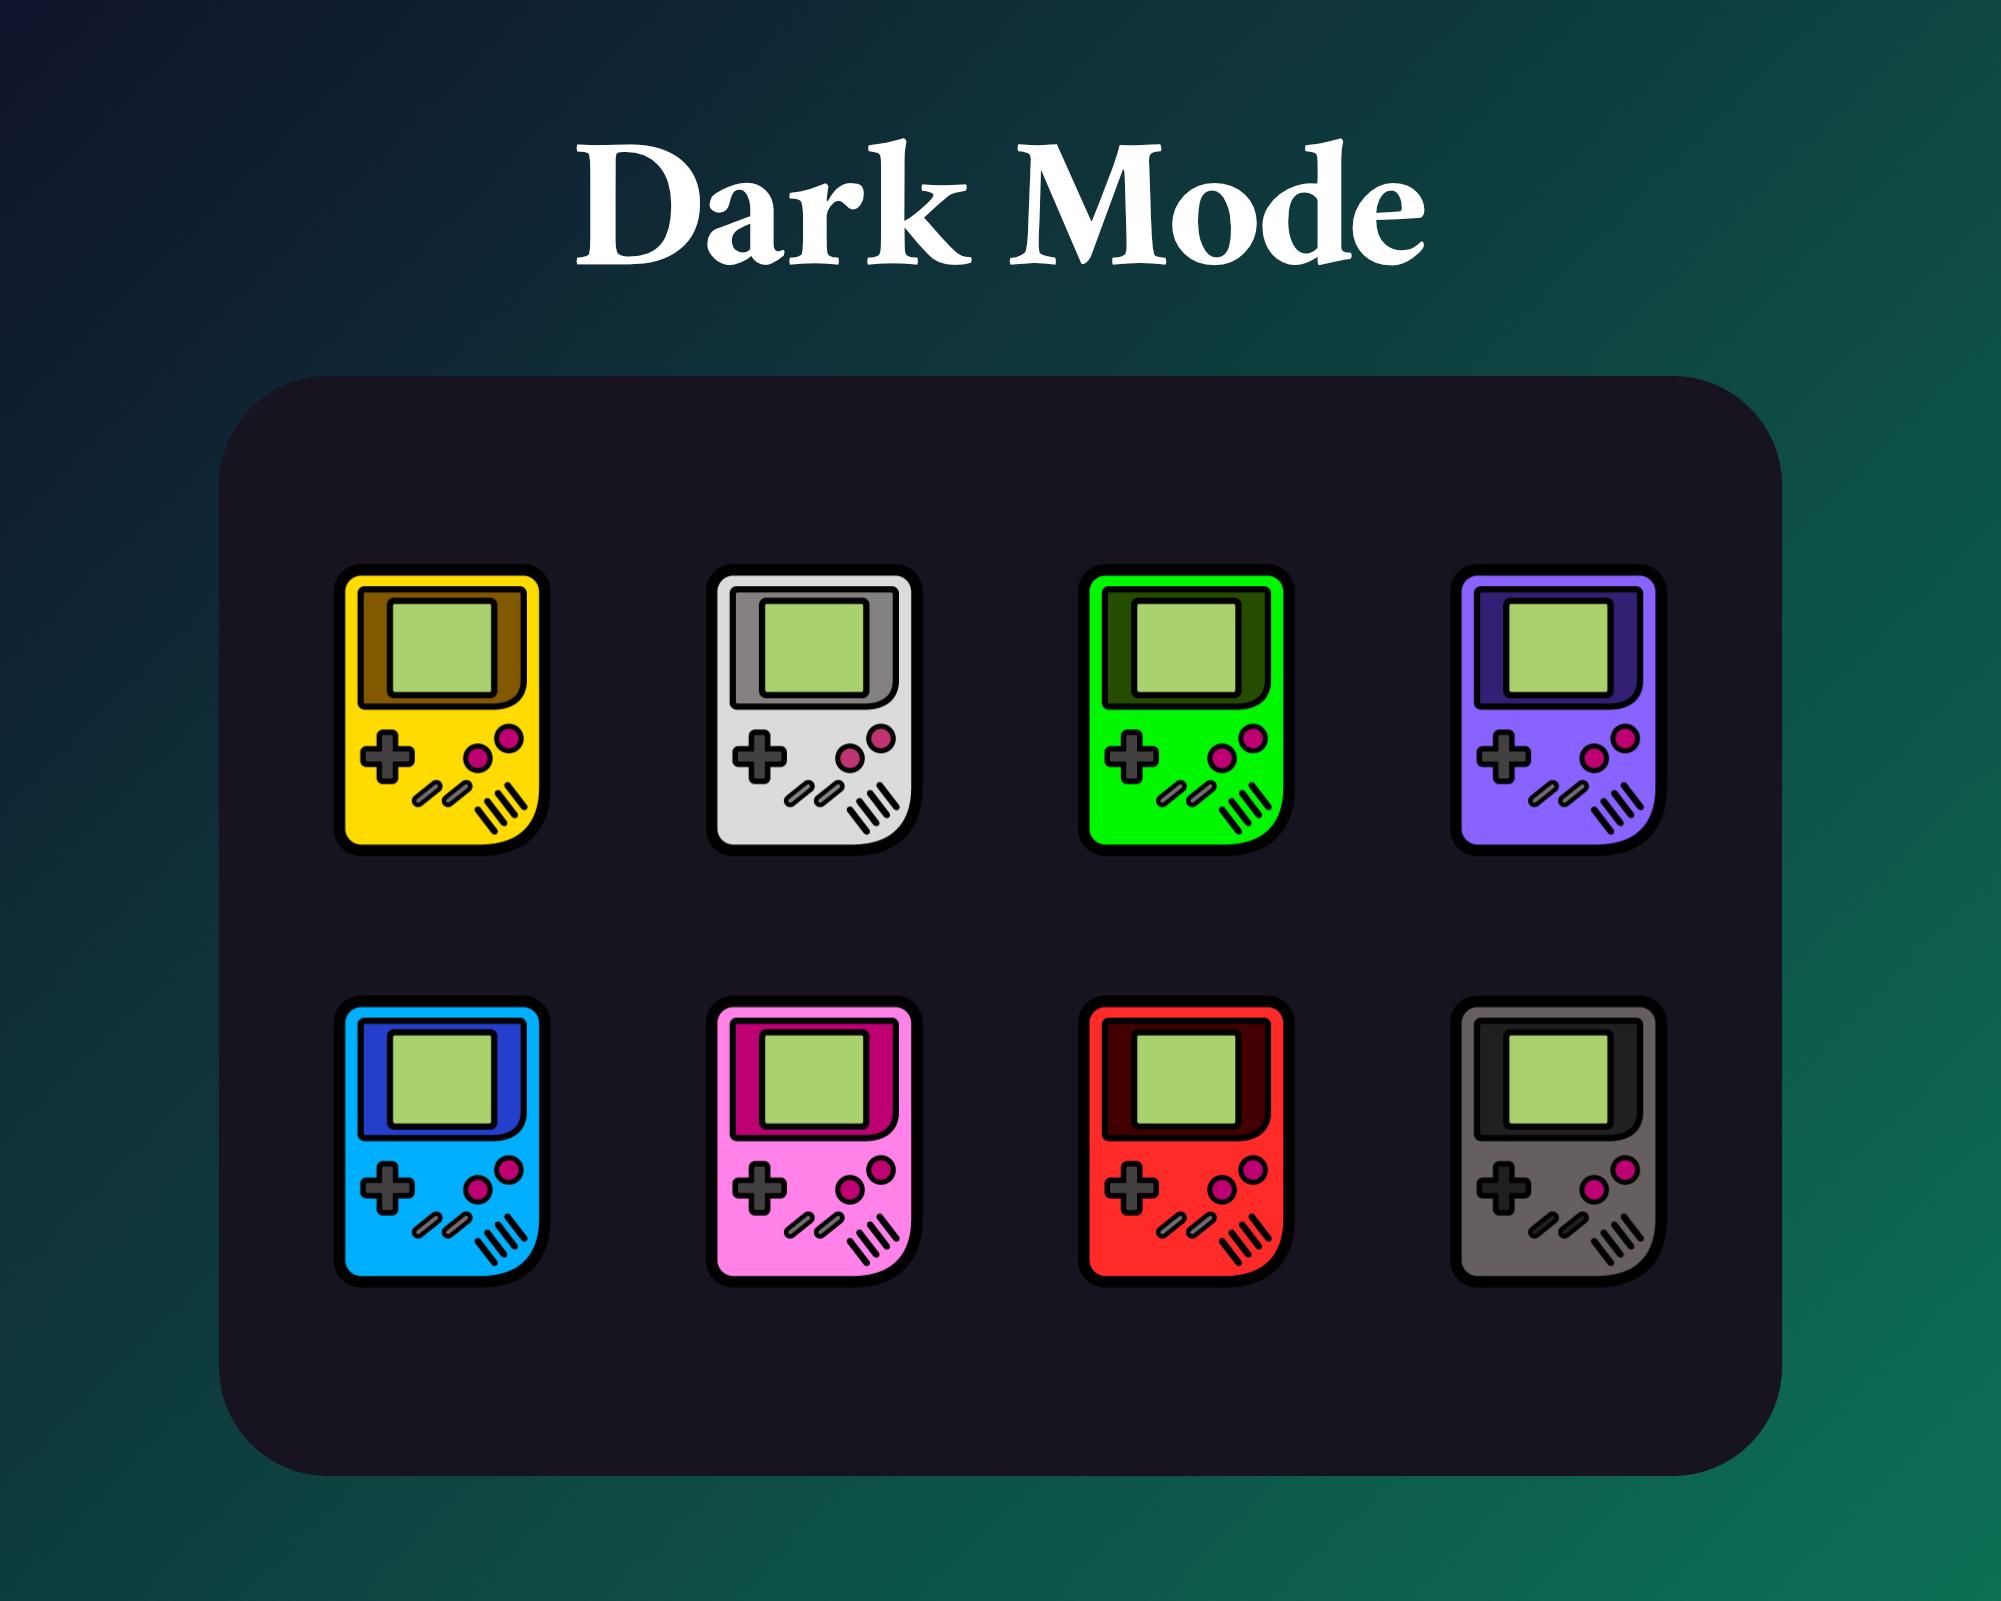 Gameboy sub badges for twitch dark mode